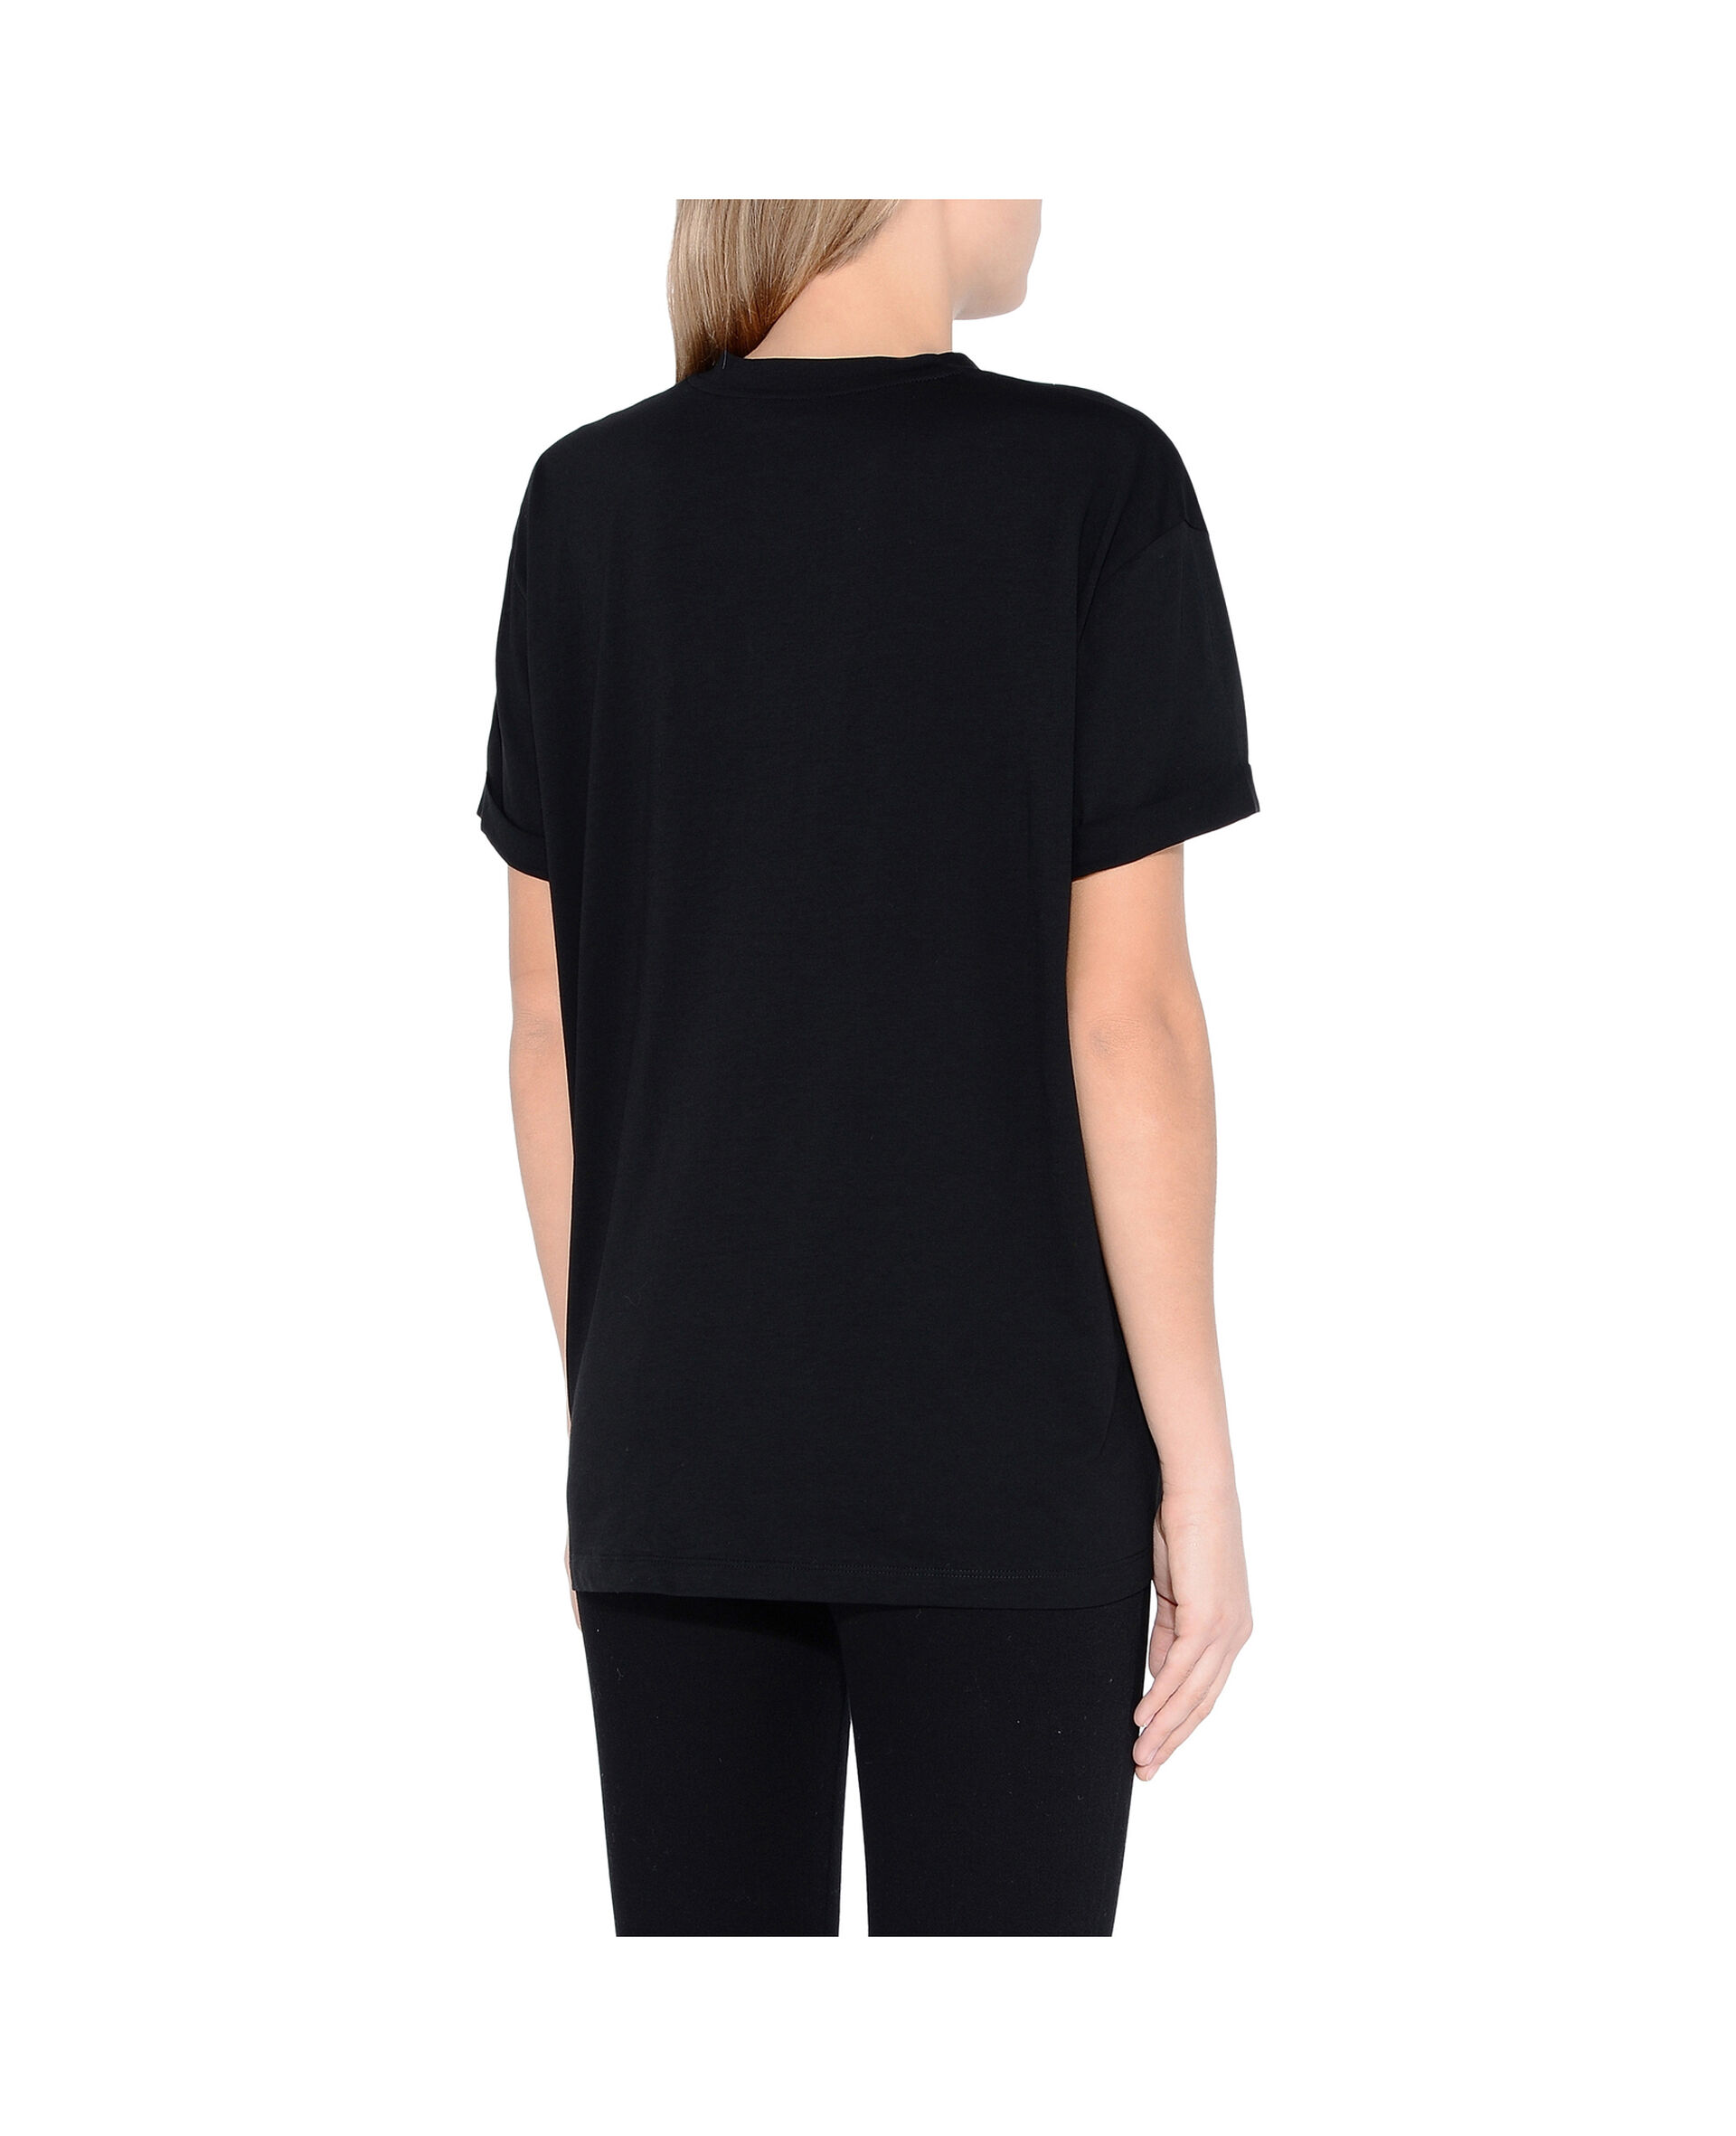 T-Shirt Ministar-Schwarz-large image number 2